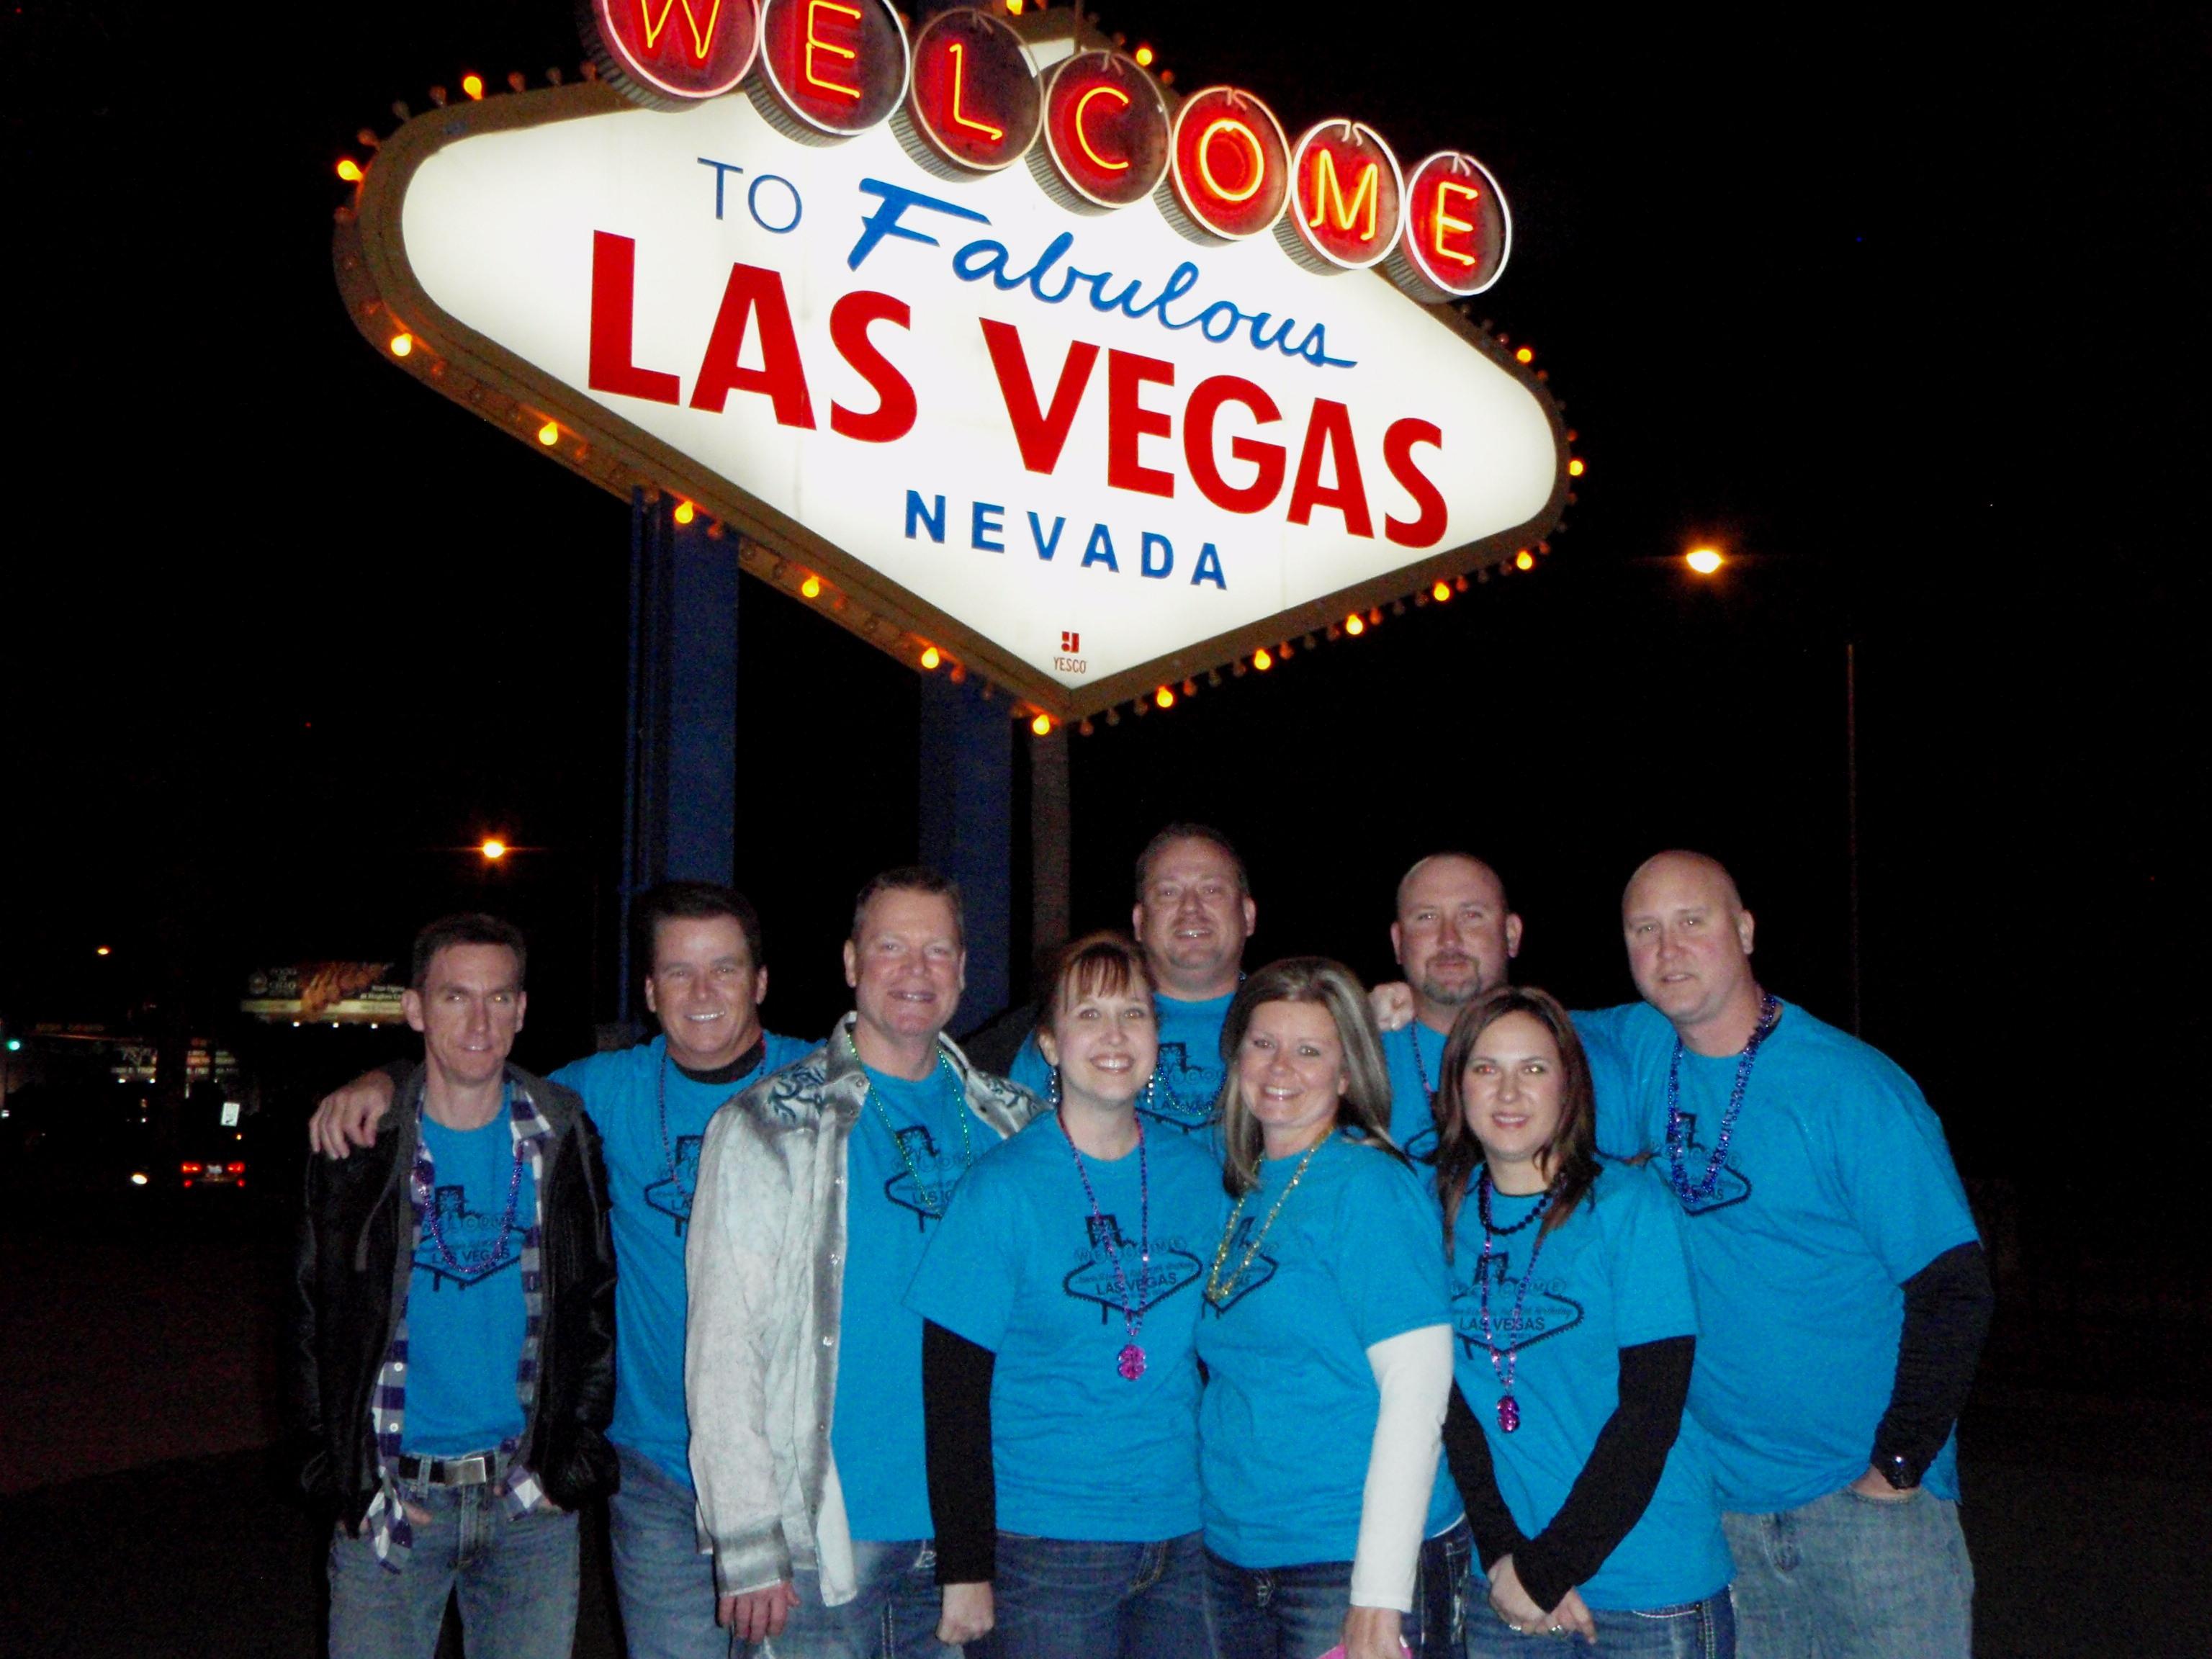 Custom T Shirts For Fabulous Las Vegas Shirts Shirt